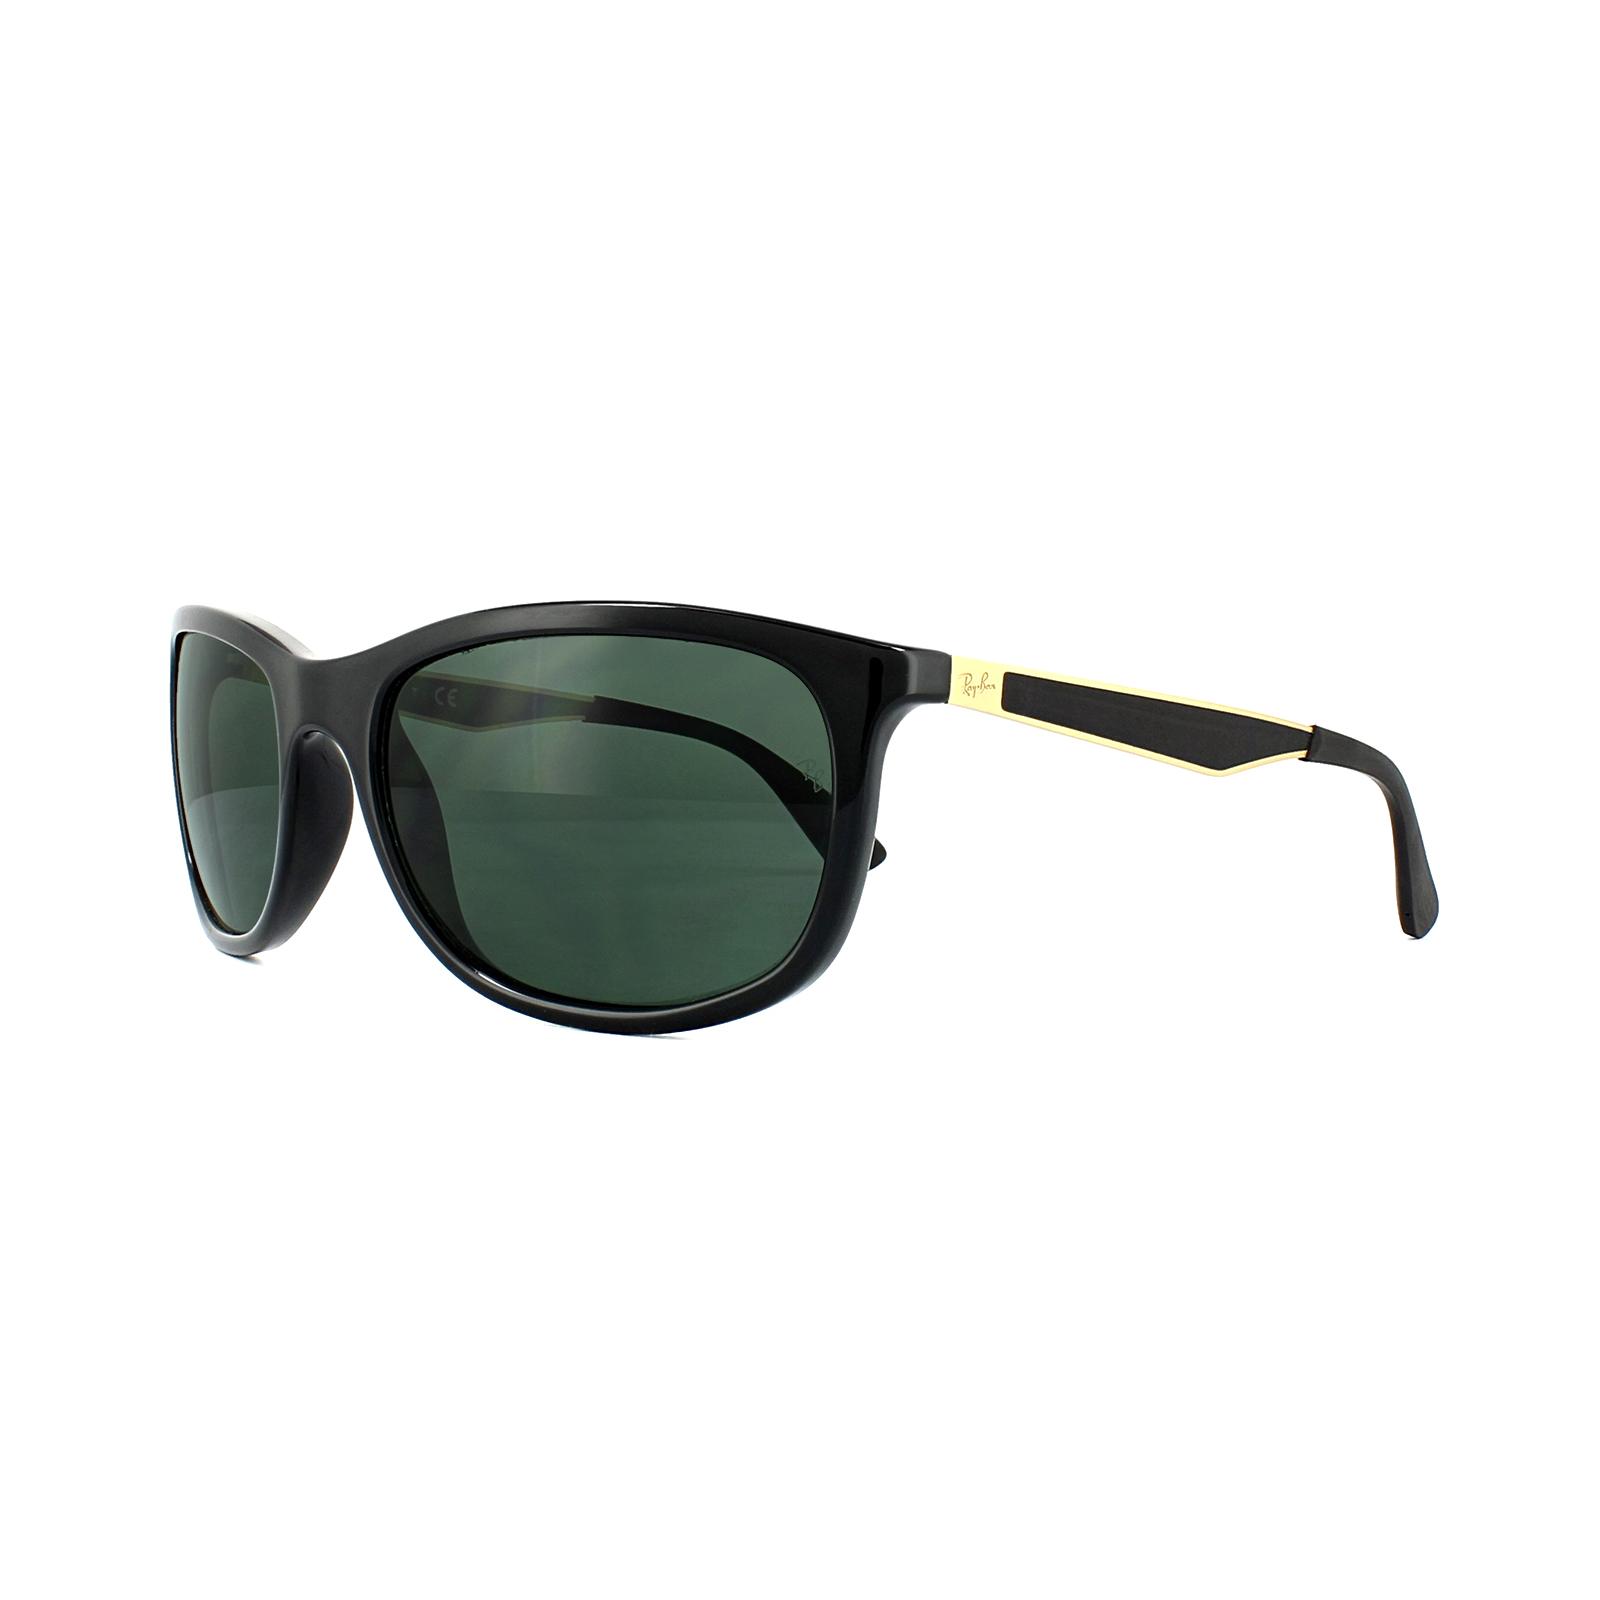 a635d56ce77 Ray-Ban Sunglasses 4267 622771 Black Gold Green G-15 8053672671339 ...